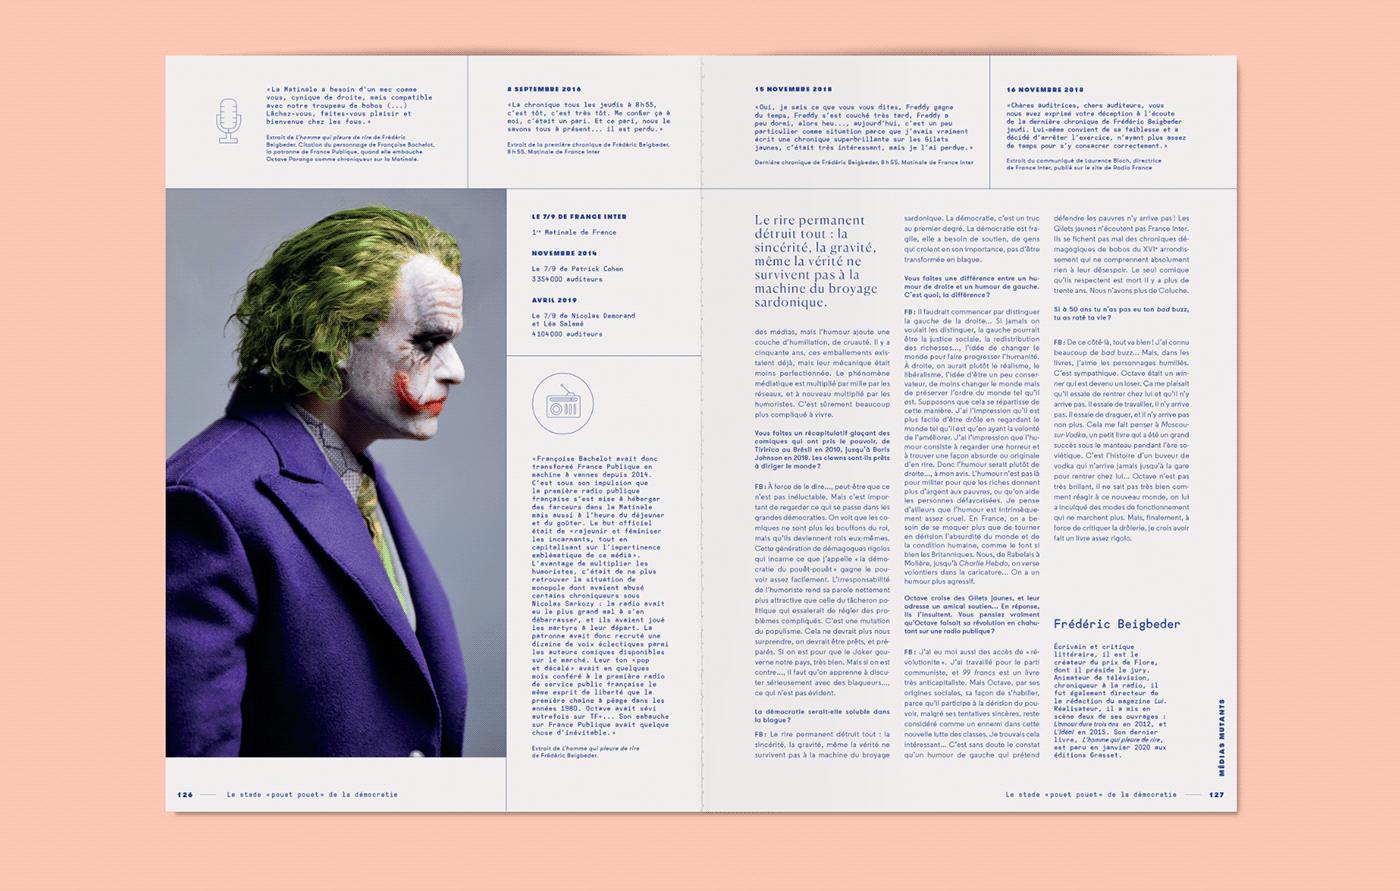 book design,cover,editorial,L'adn,lola dupre,magazine,type,typography  ,dialogue,vj-type